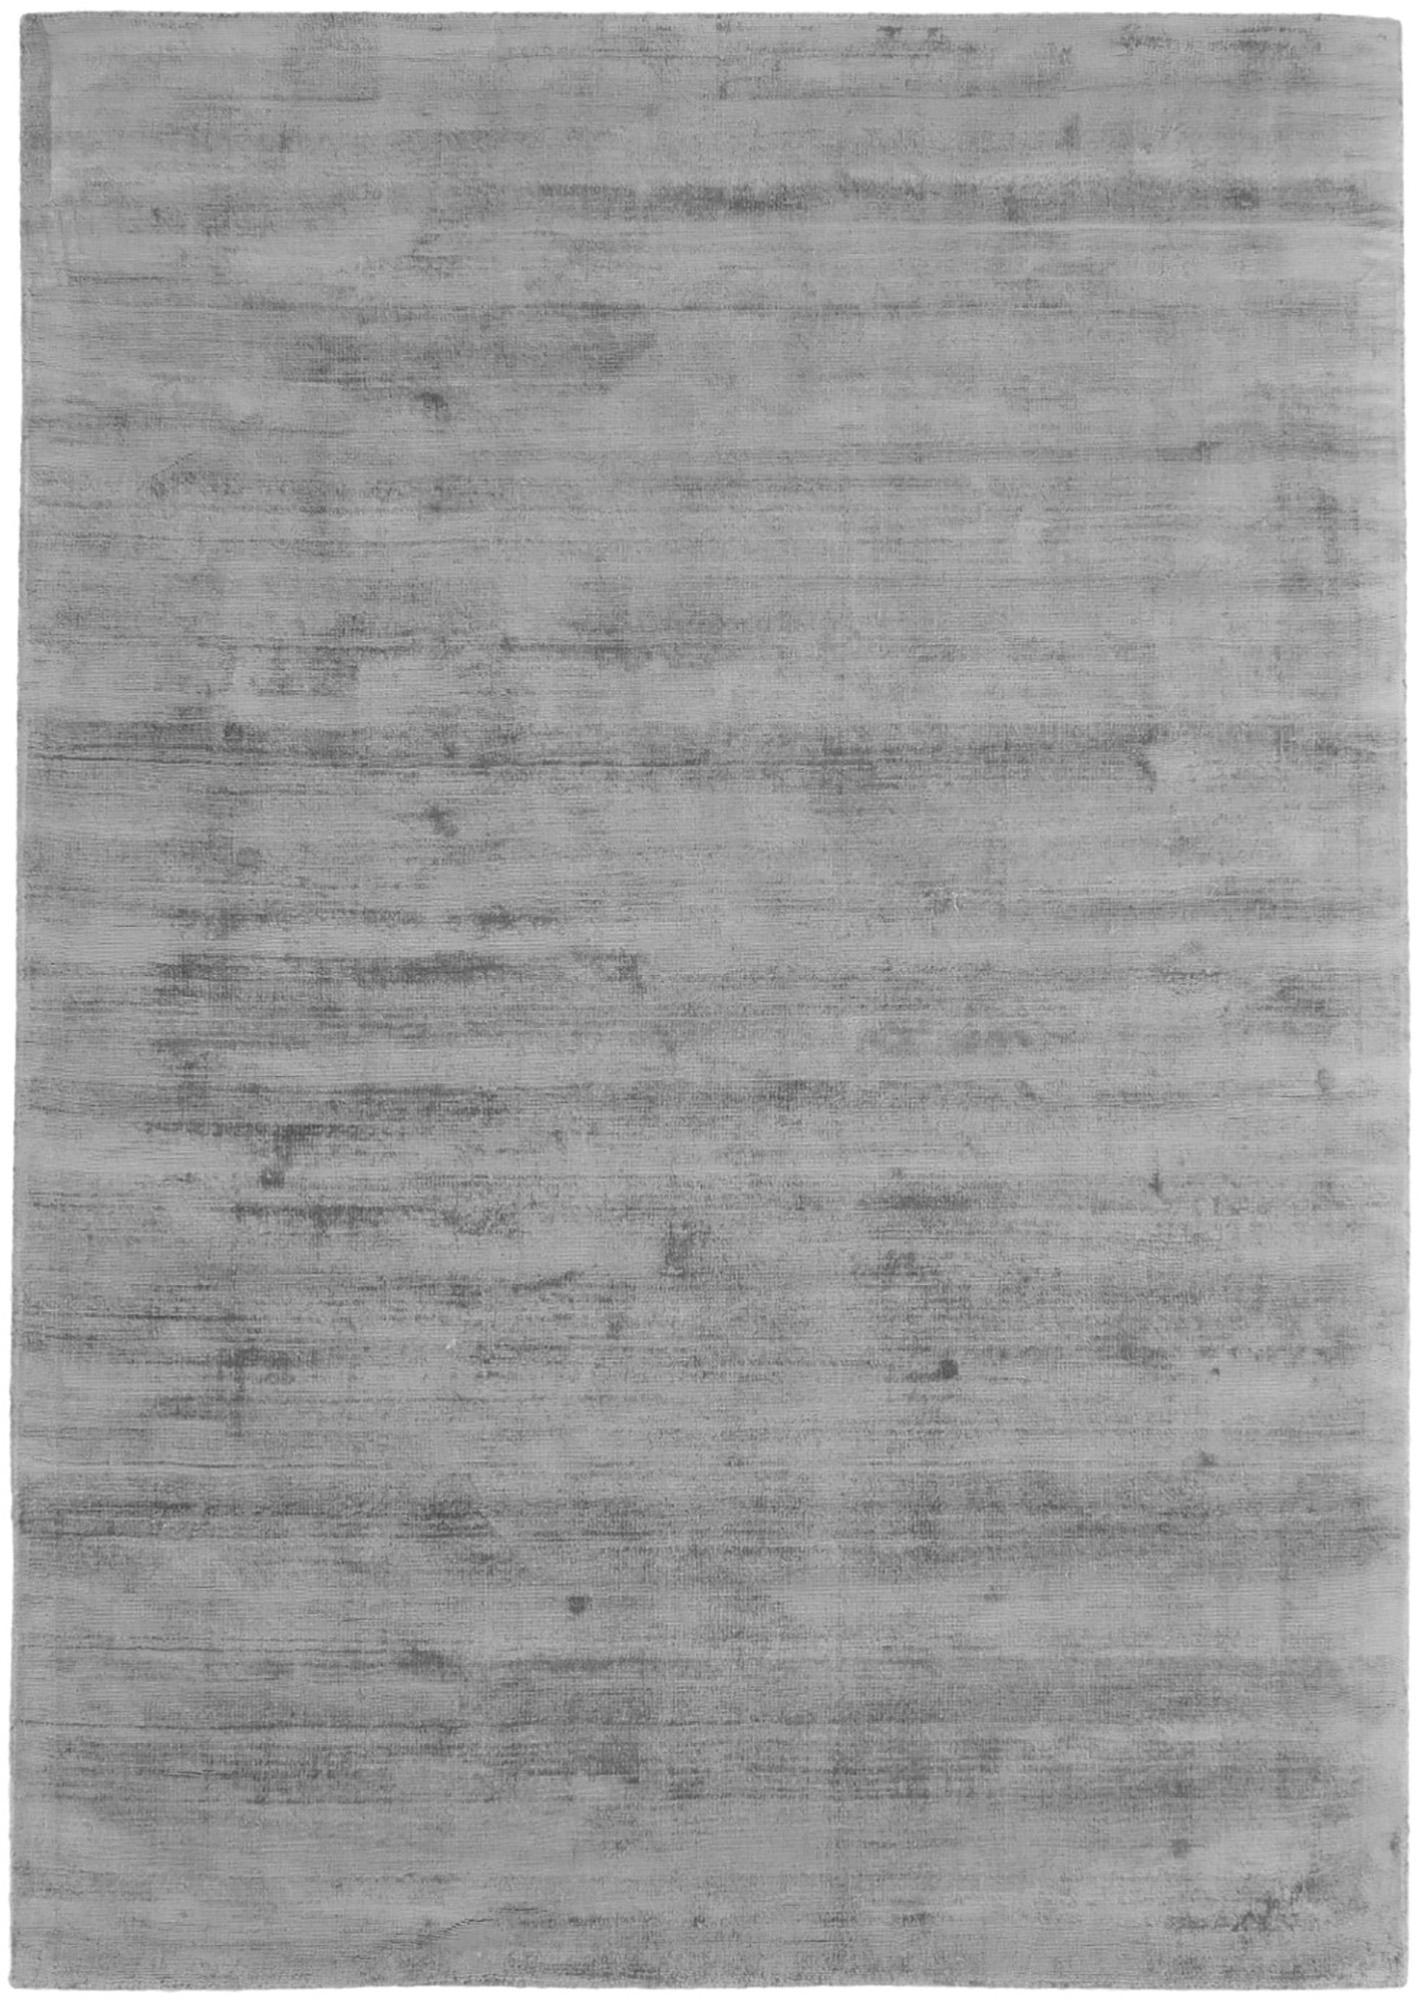 Handgewebter Viskoseteppich Jane in Grau, Flor: 100% Viskose, Grau, B 160 x L 230 cm (Größe M)